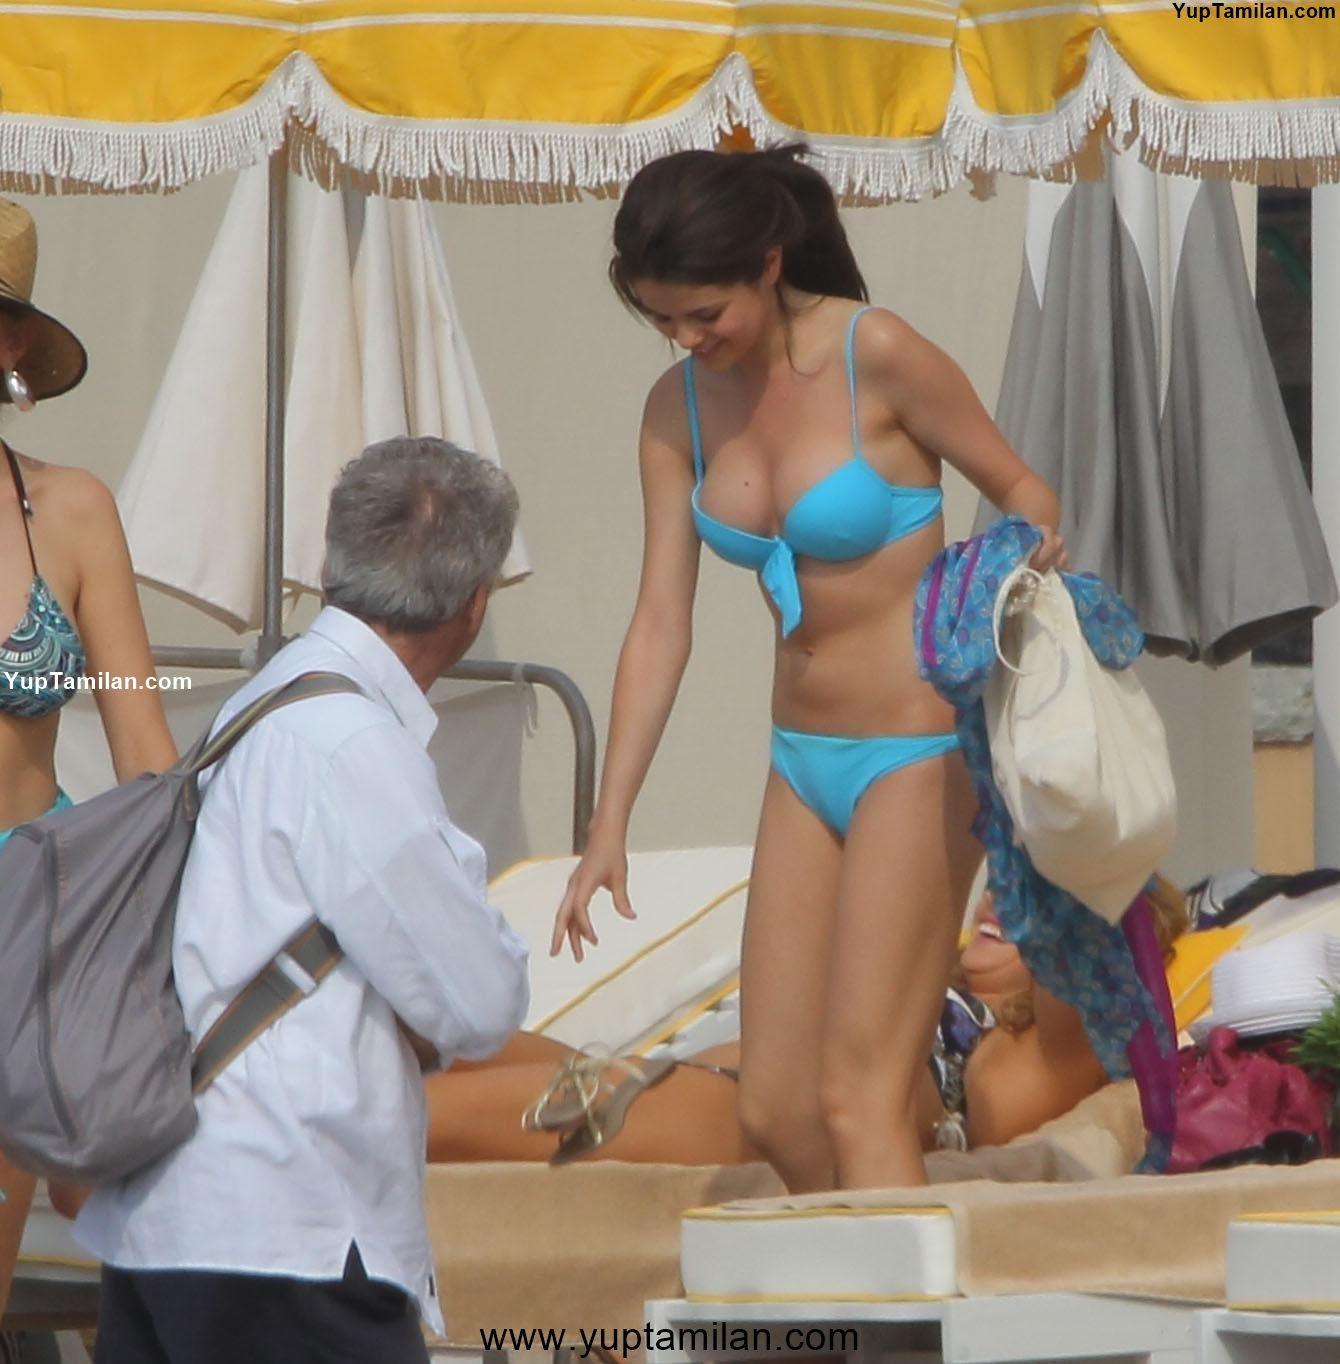 Selena Gomez Sexy Swimwear, Lingrie Images